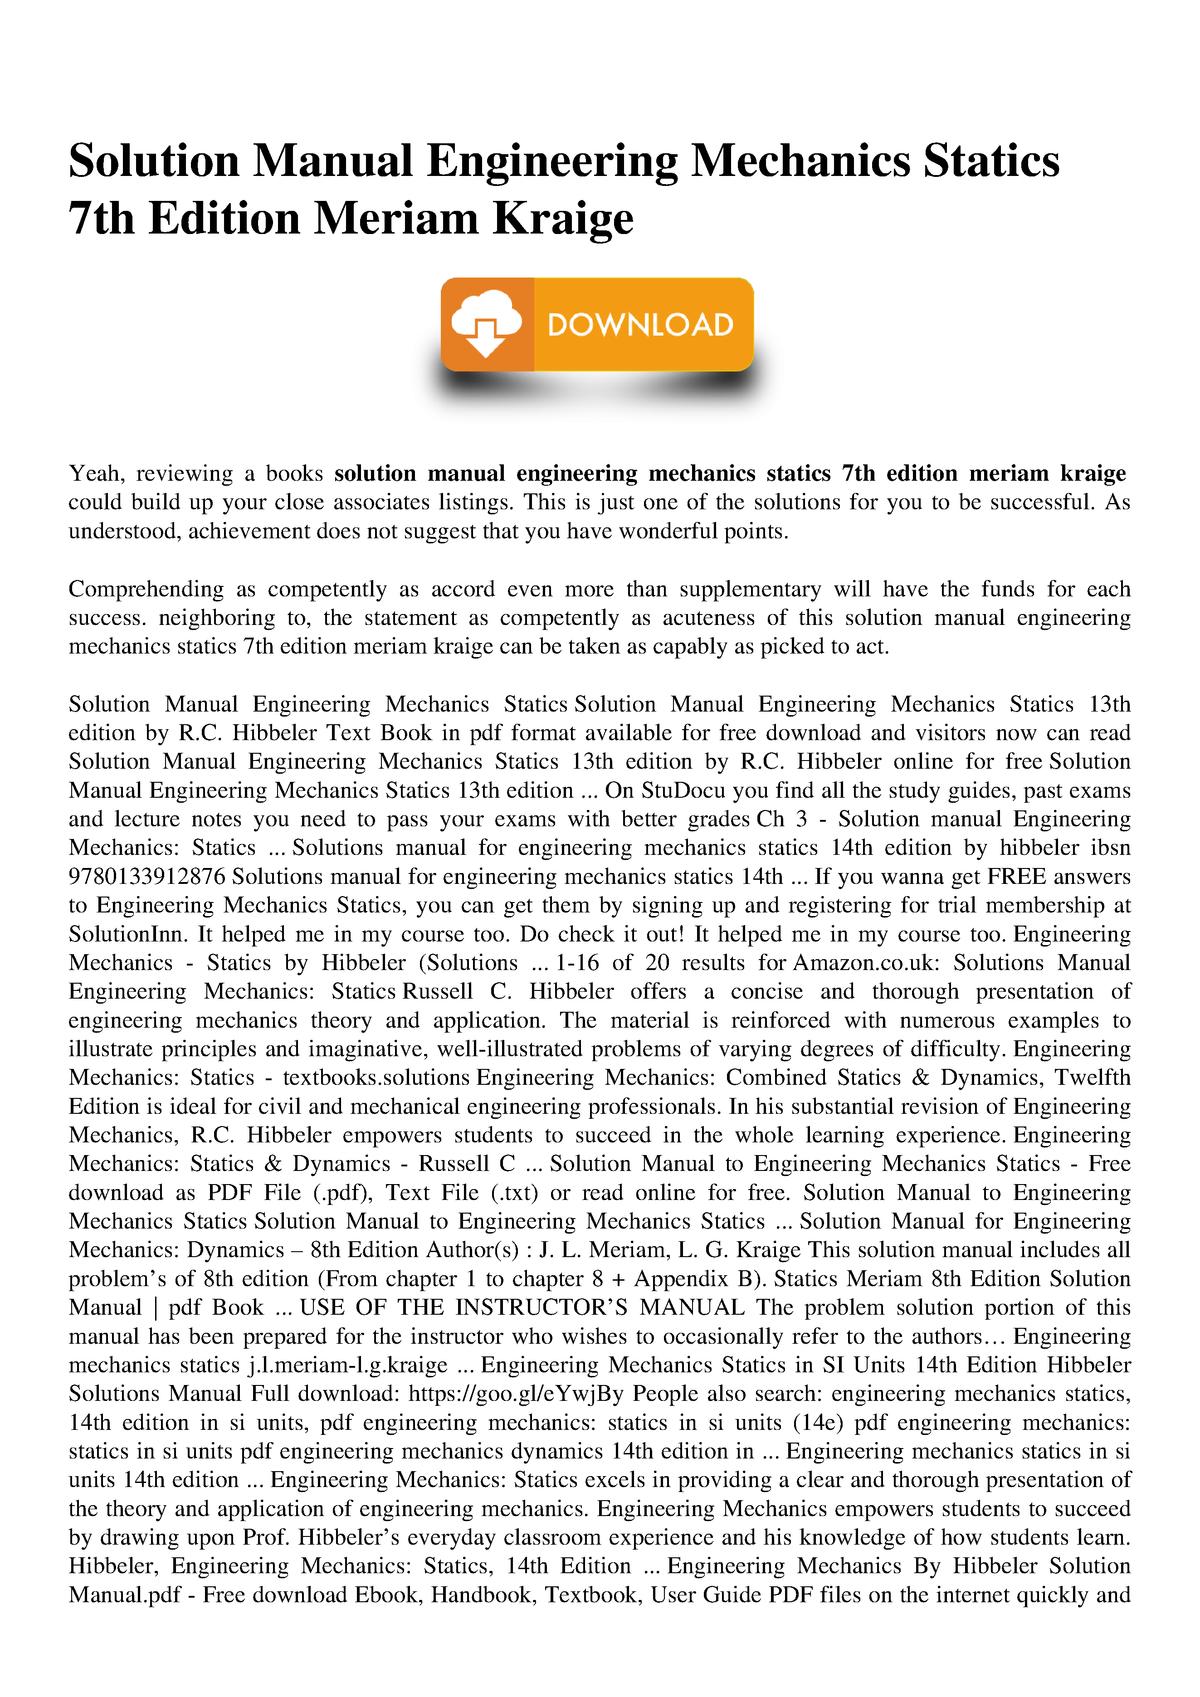 Solution Manual Engineering Mechanics Statics 7th Edition